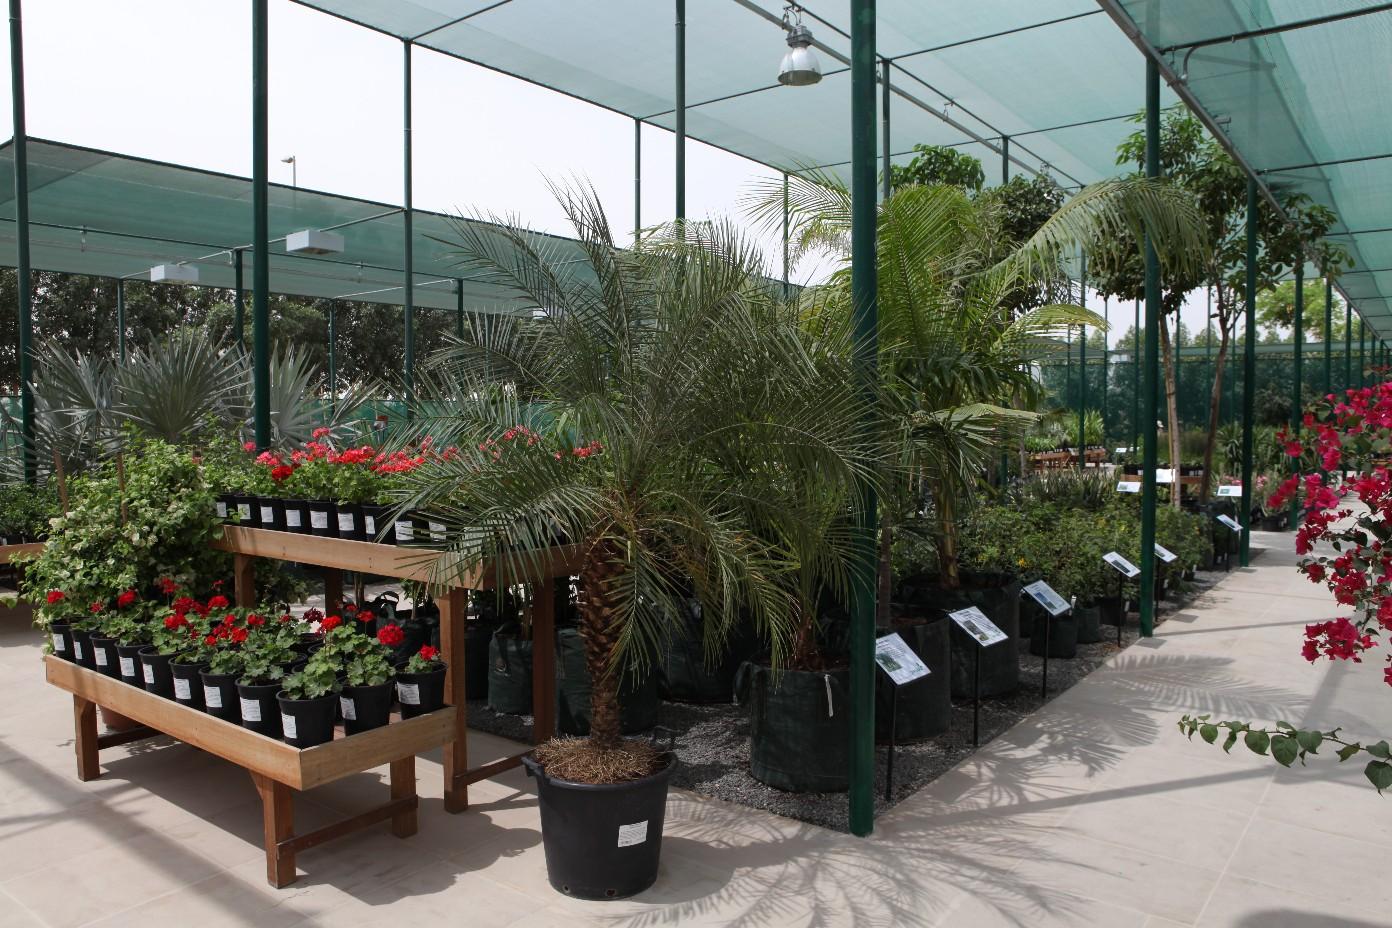 Dubai s new greenworks nursery a breath of fresh air for for Garden design dubai